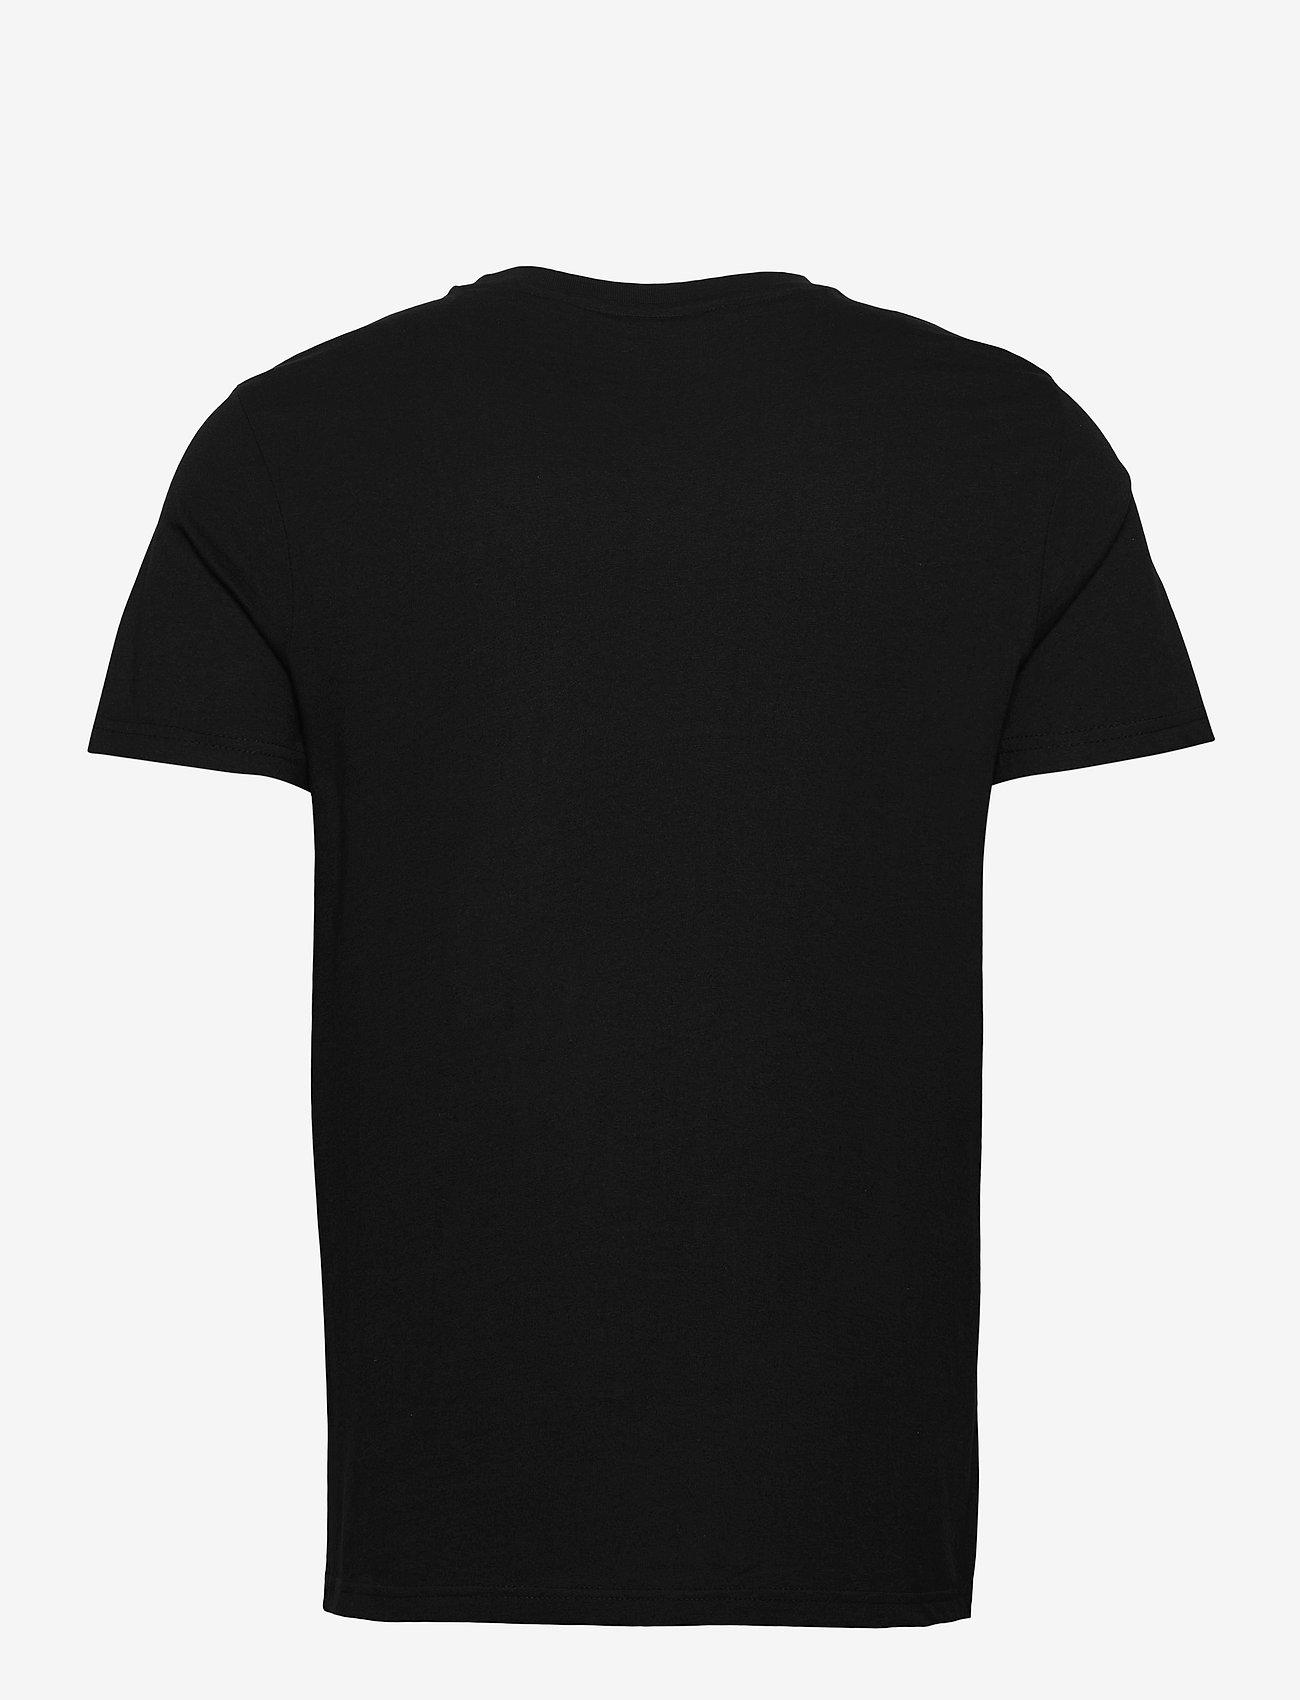 FILA - MEN SAMURU tee - t-shirts - black - 1